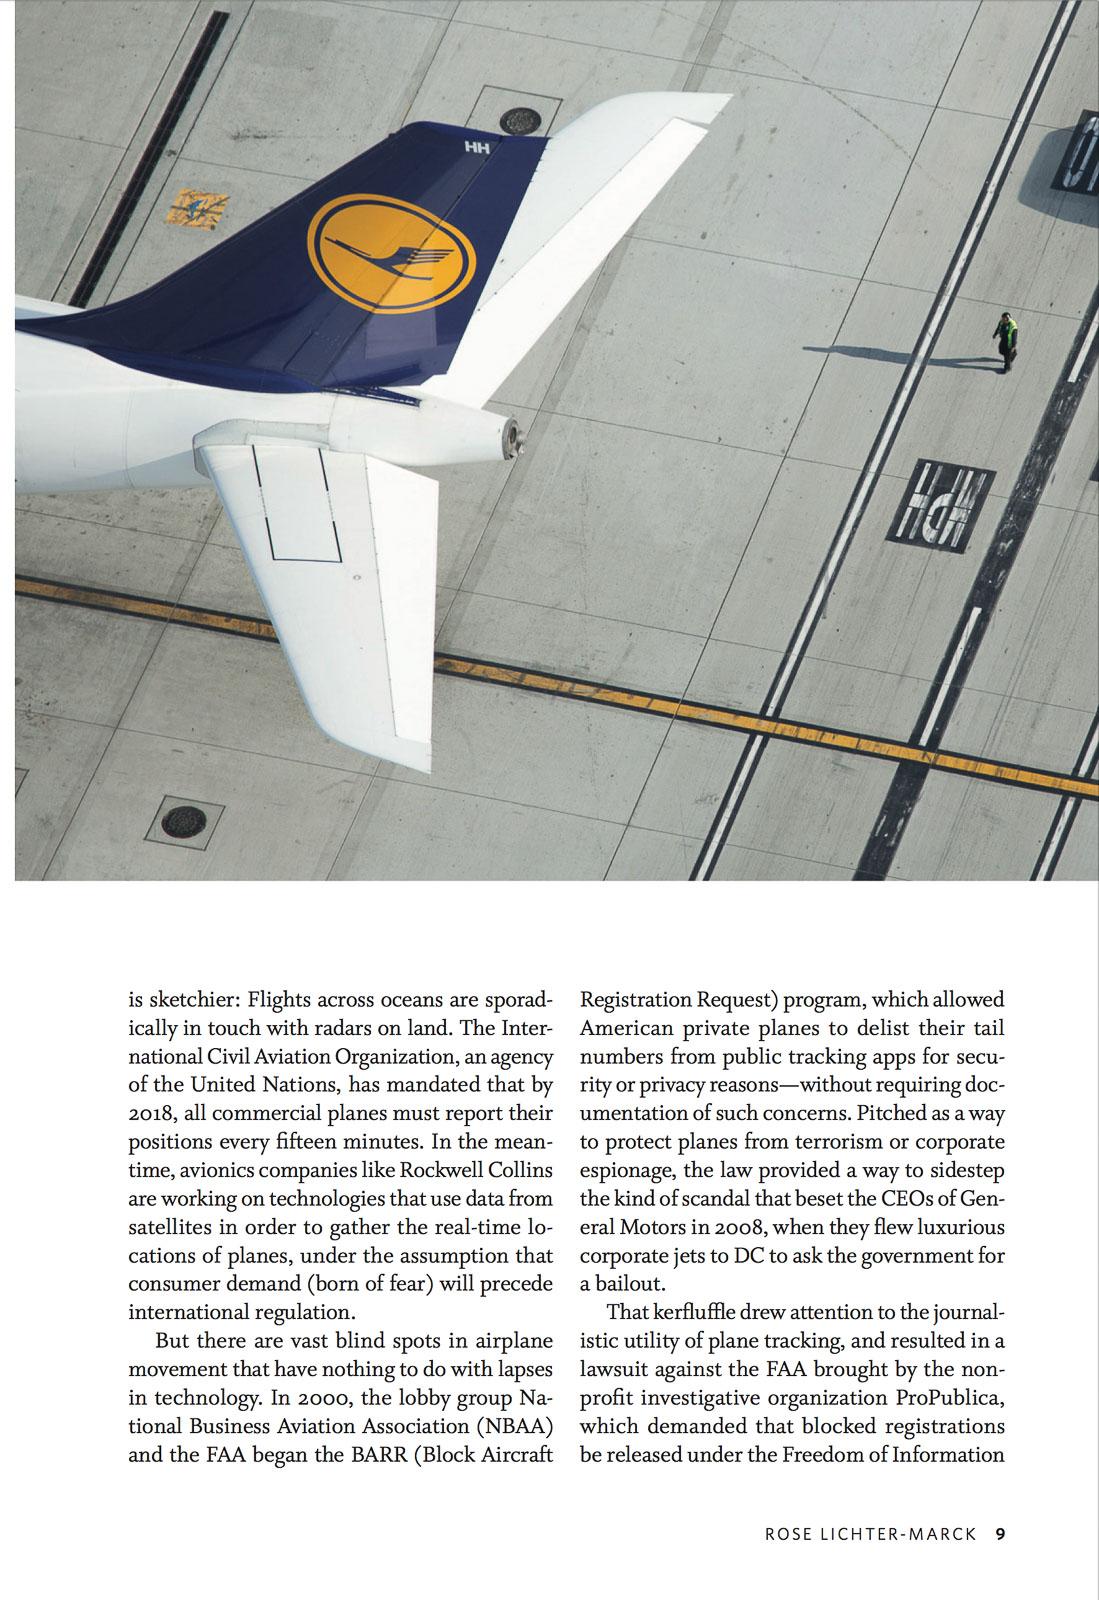 Mike-Kelley-Aviation-Photography-3.jpg